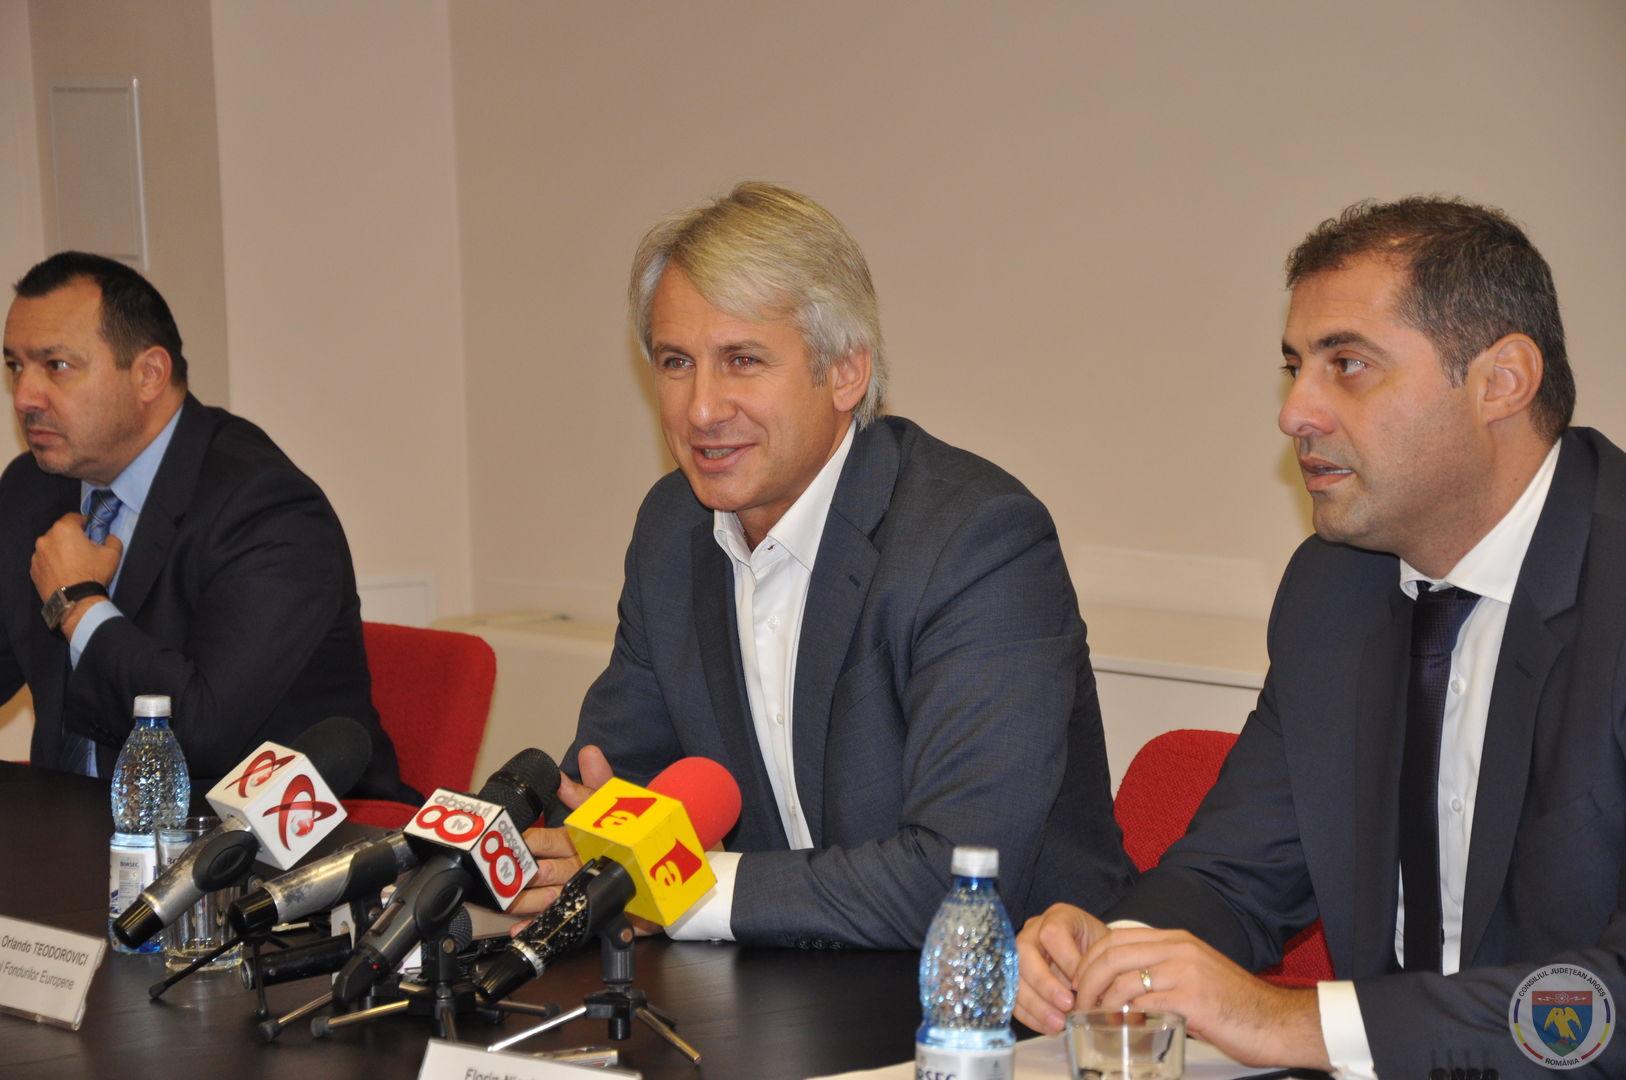 Conferinta Ministrii Teodorovici & Jianu 11.11.2014 (4).JPG